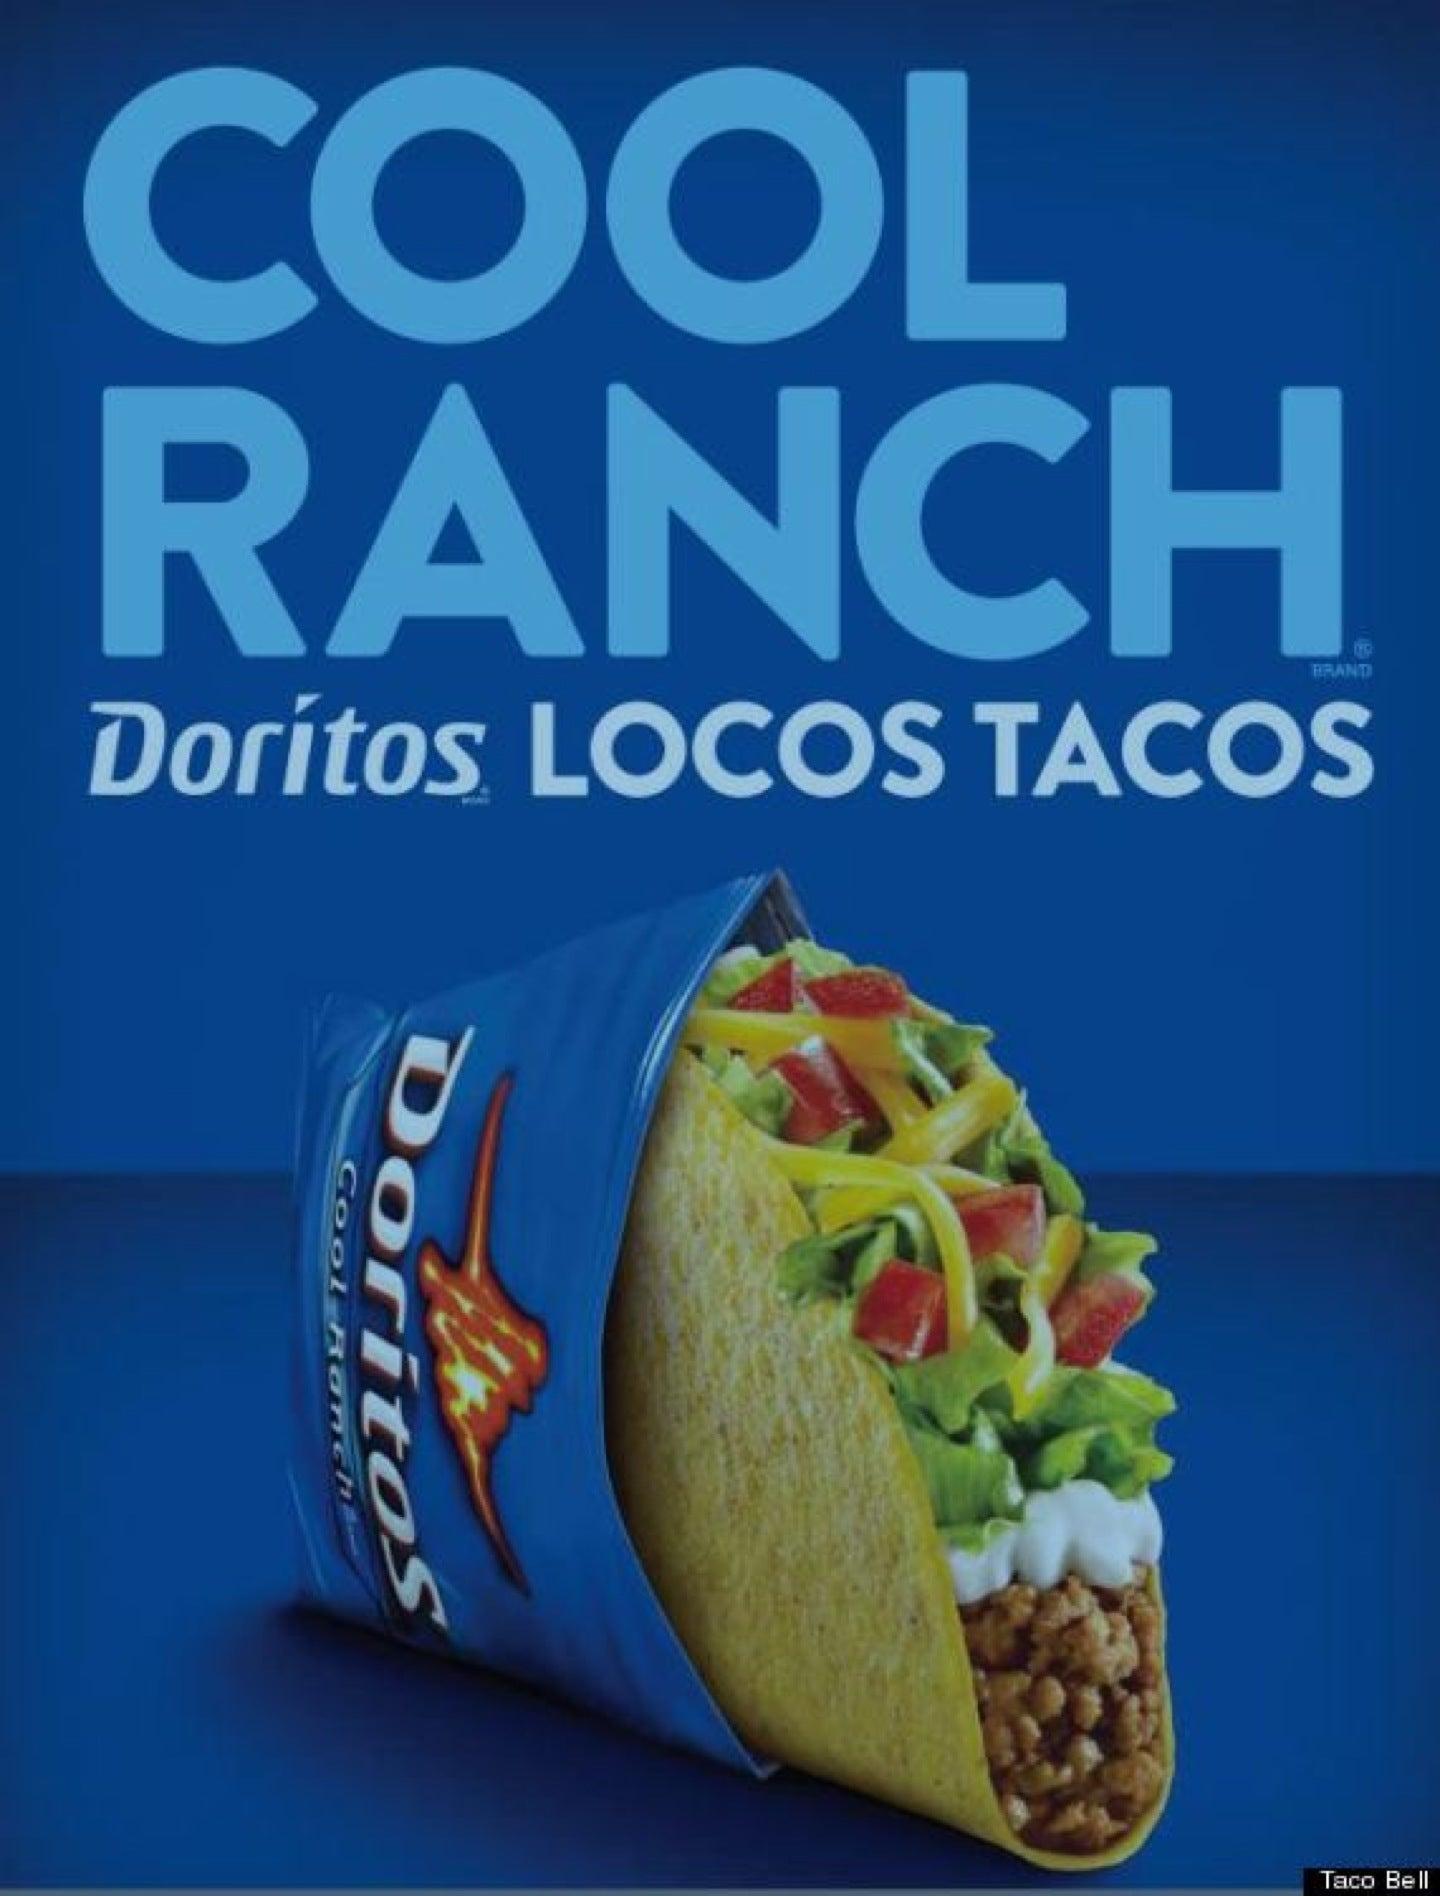 Pizza Hut,fast food,mexican food,mexican food|taco|fast food,taco